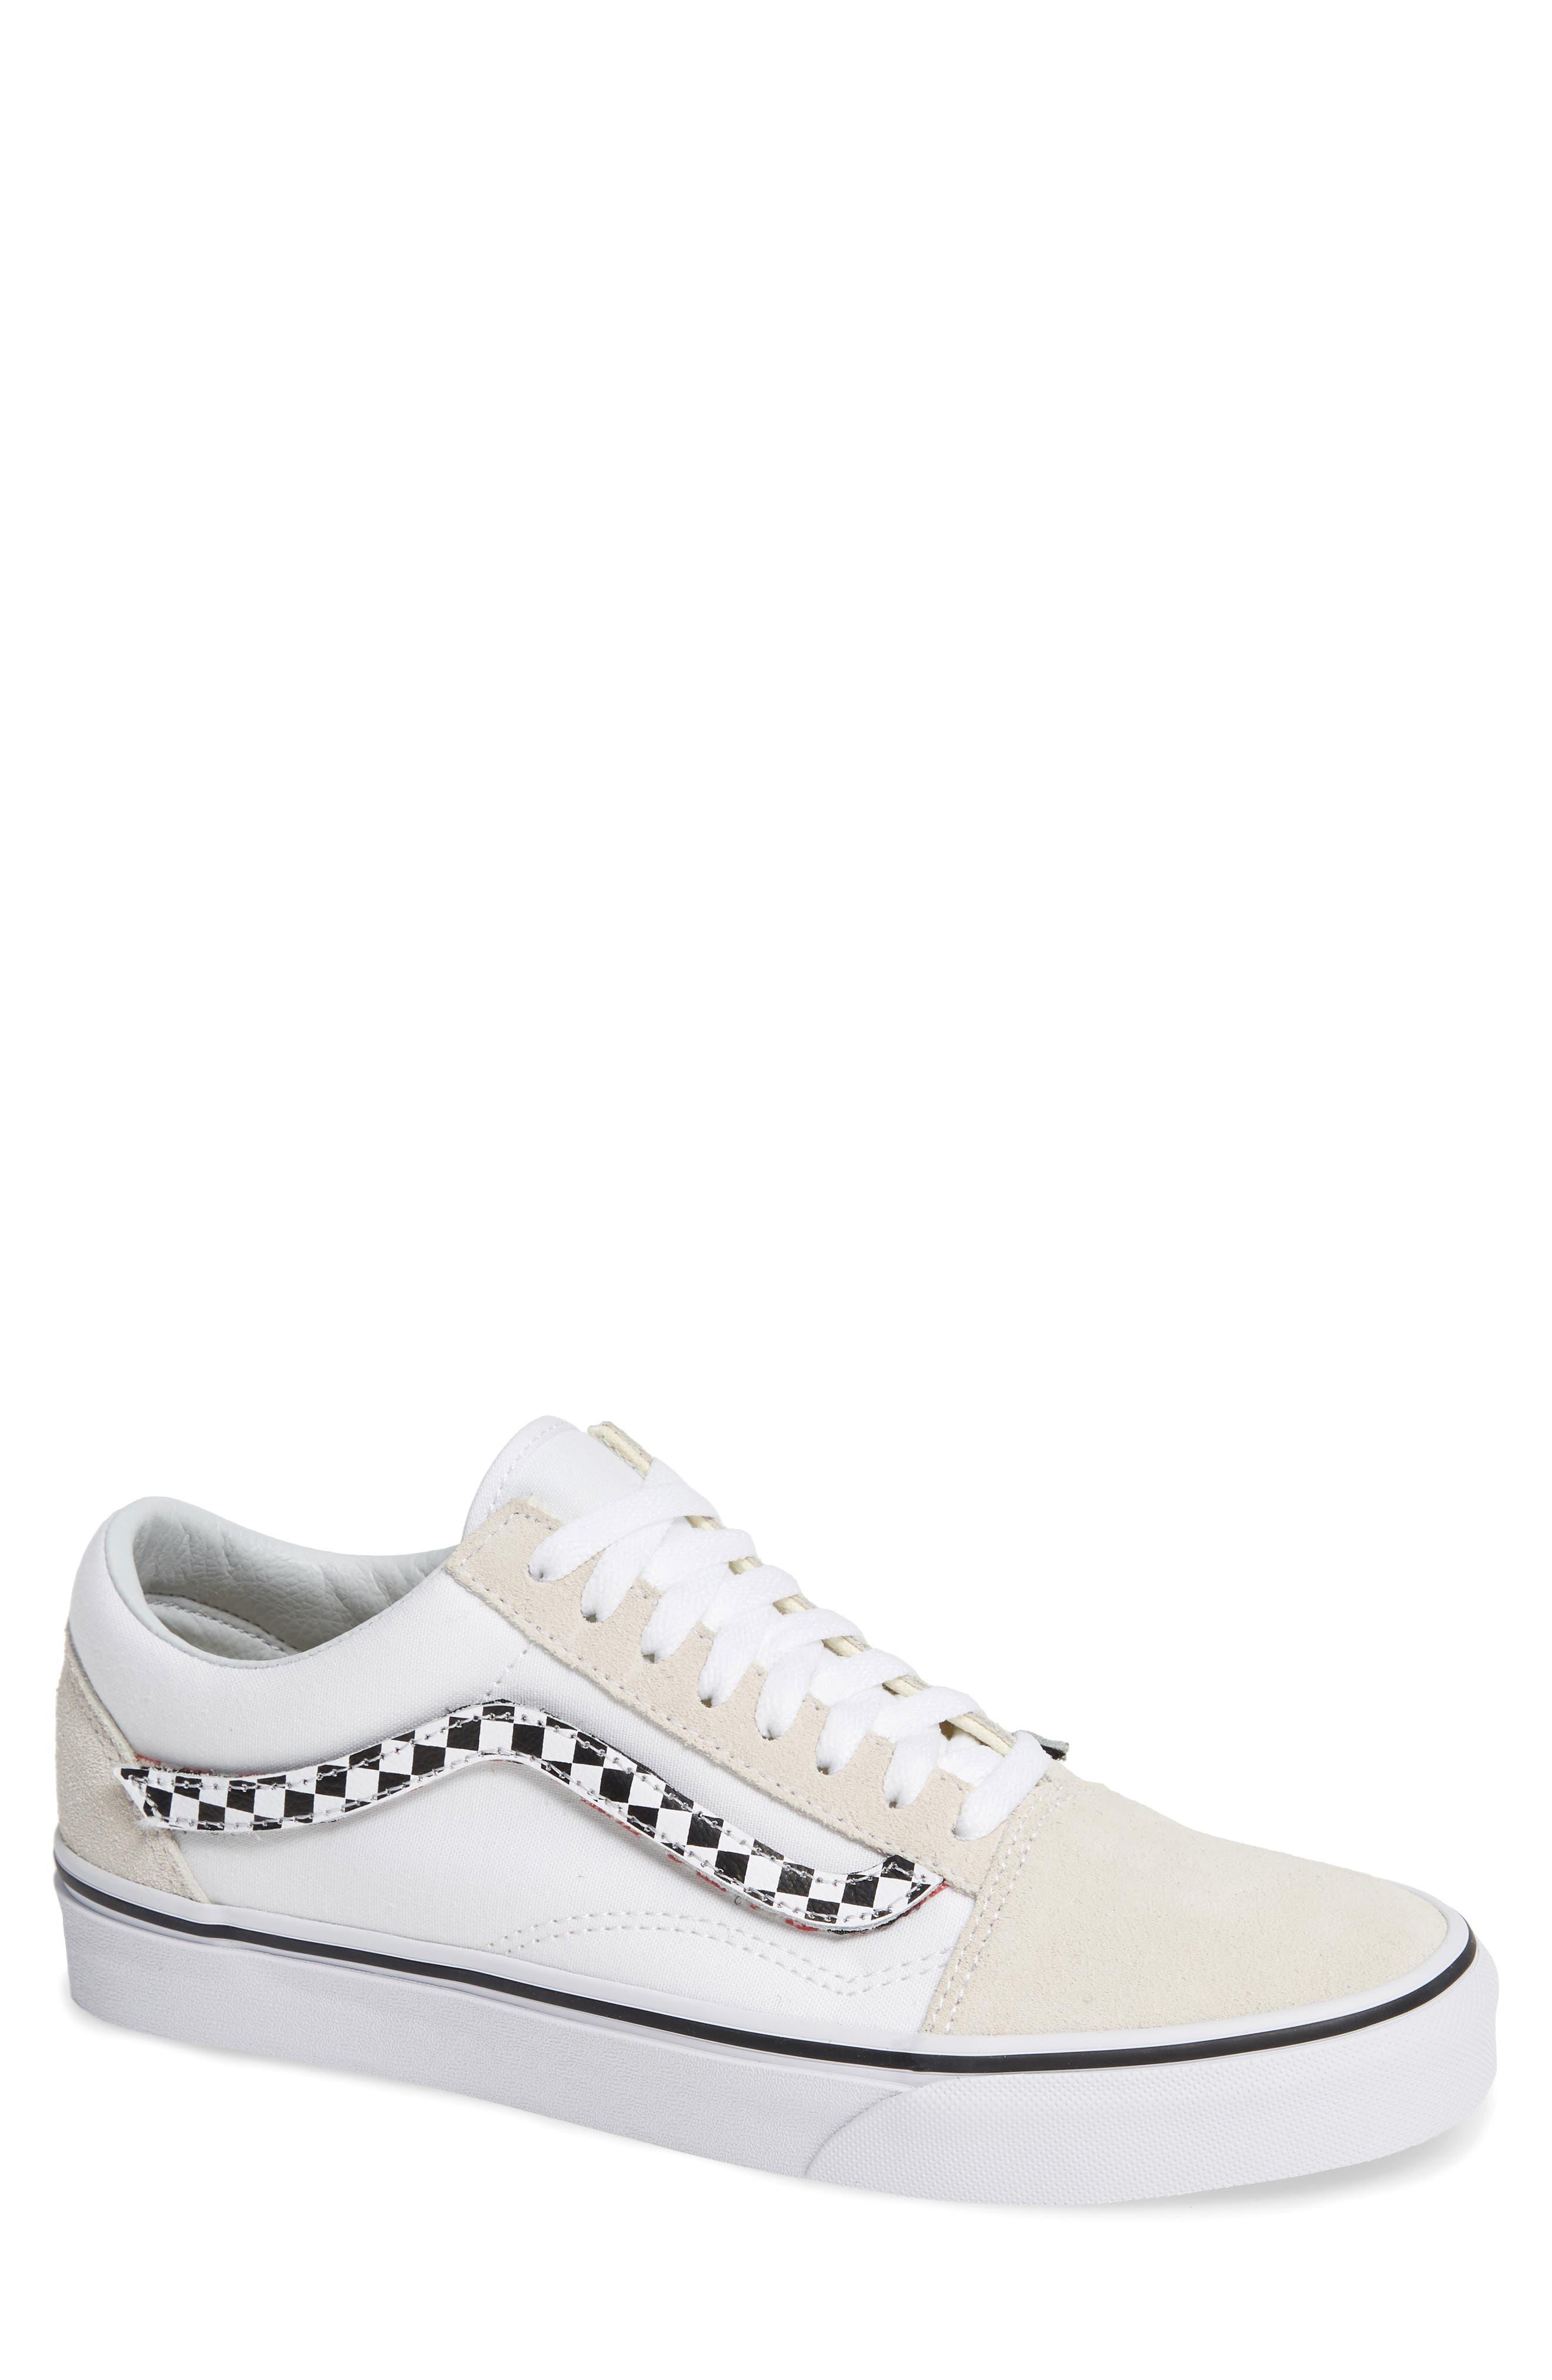 VANS Old Skool Sneaker, Main, color, TRUE WHITE/ TRUE WHITE